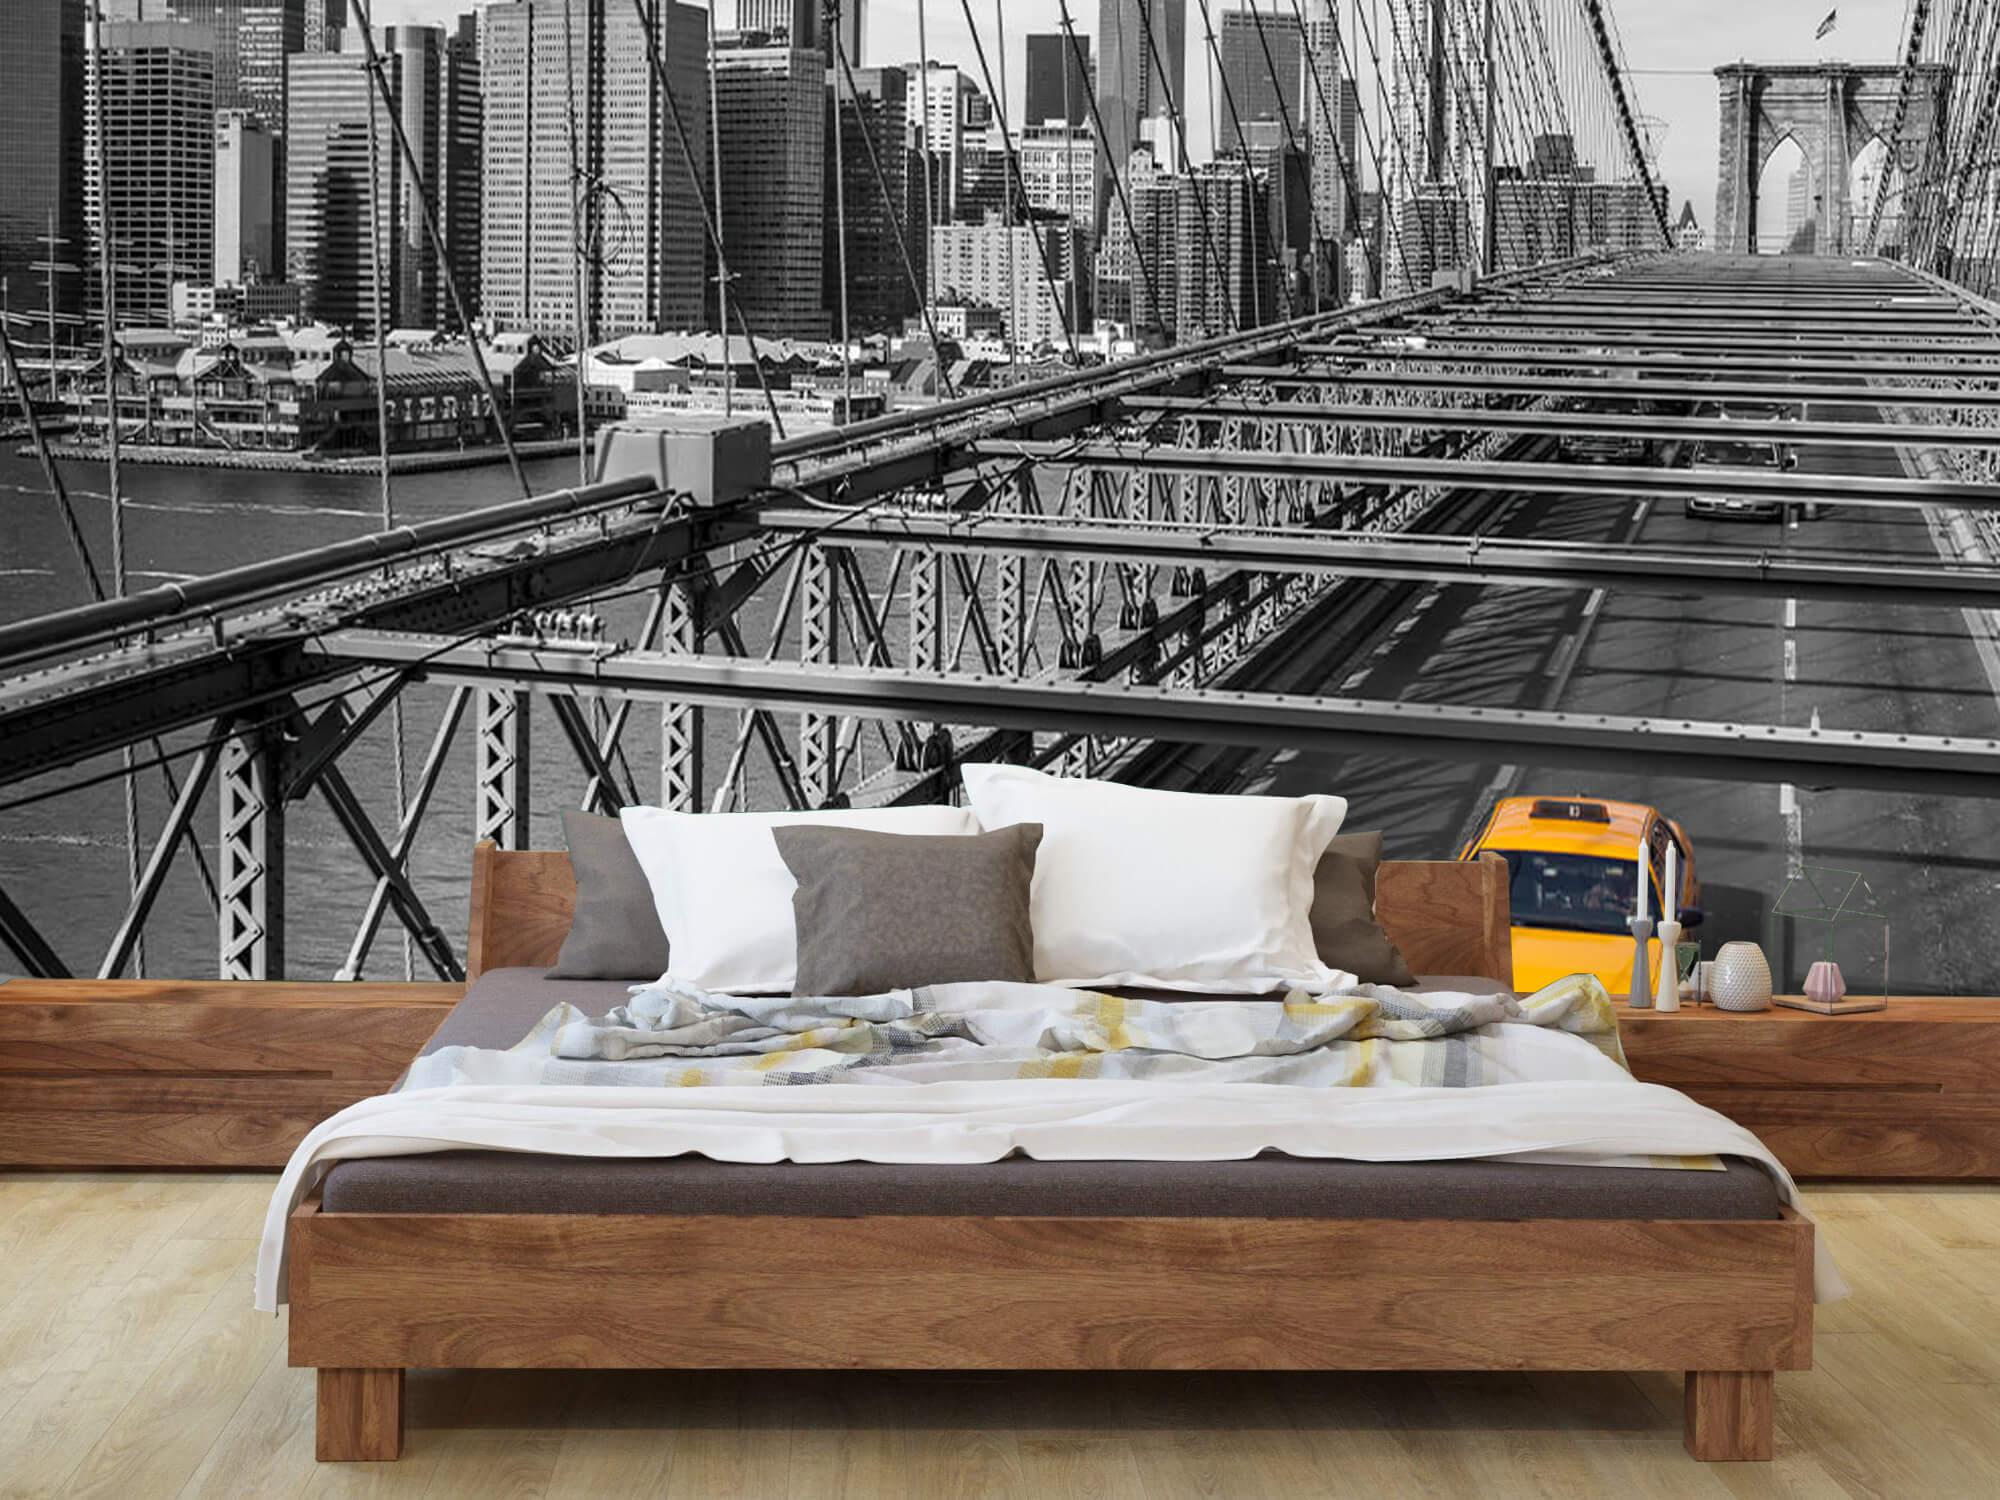 Un taxi sur le pont de Brooklyn 3